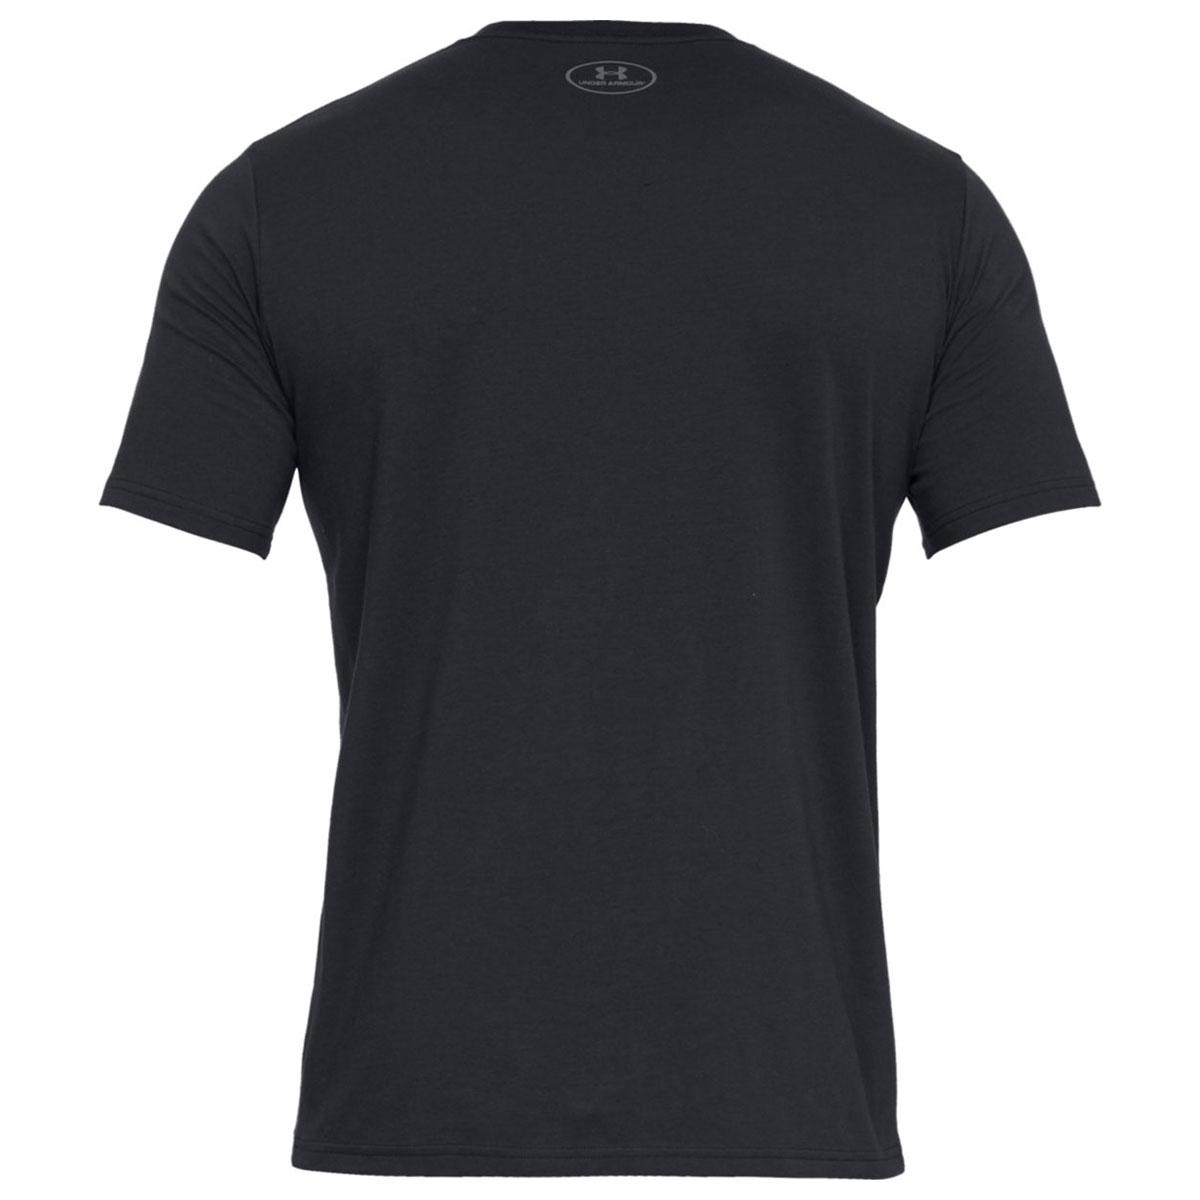 Under-Armour-Mens-2019-UA-Boxed-Sportstyle-HeatGear-Training-Gym-T-Shirt-Tee thumbnail 9